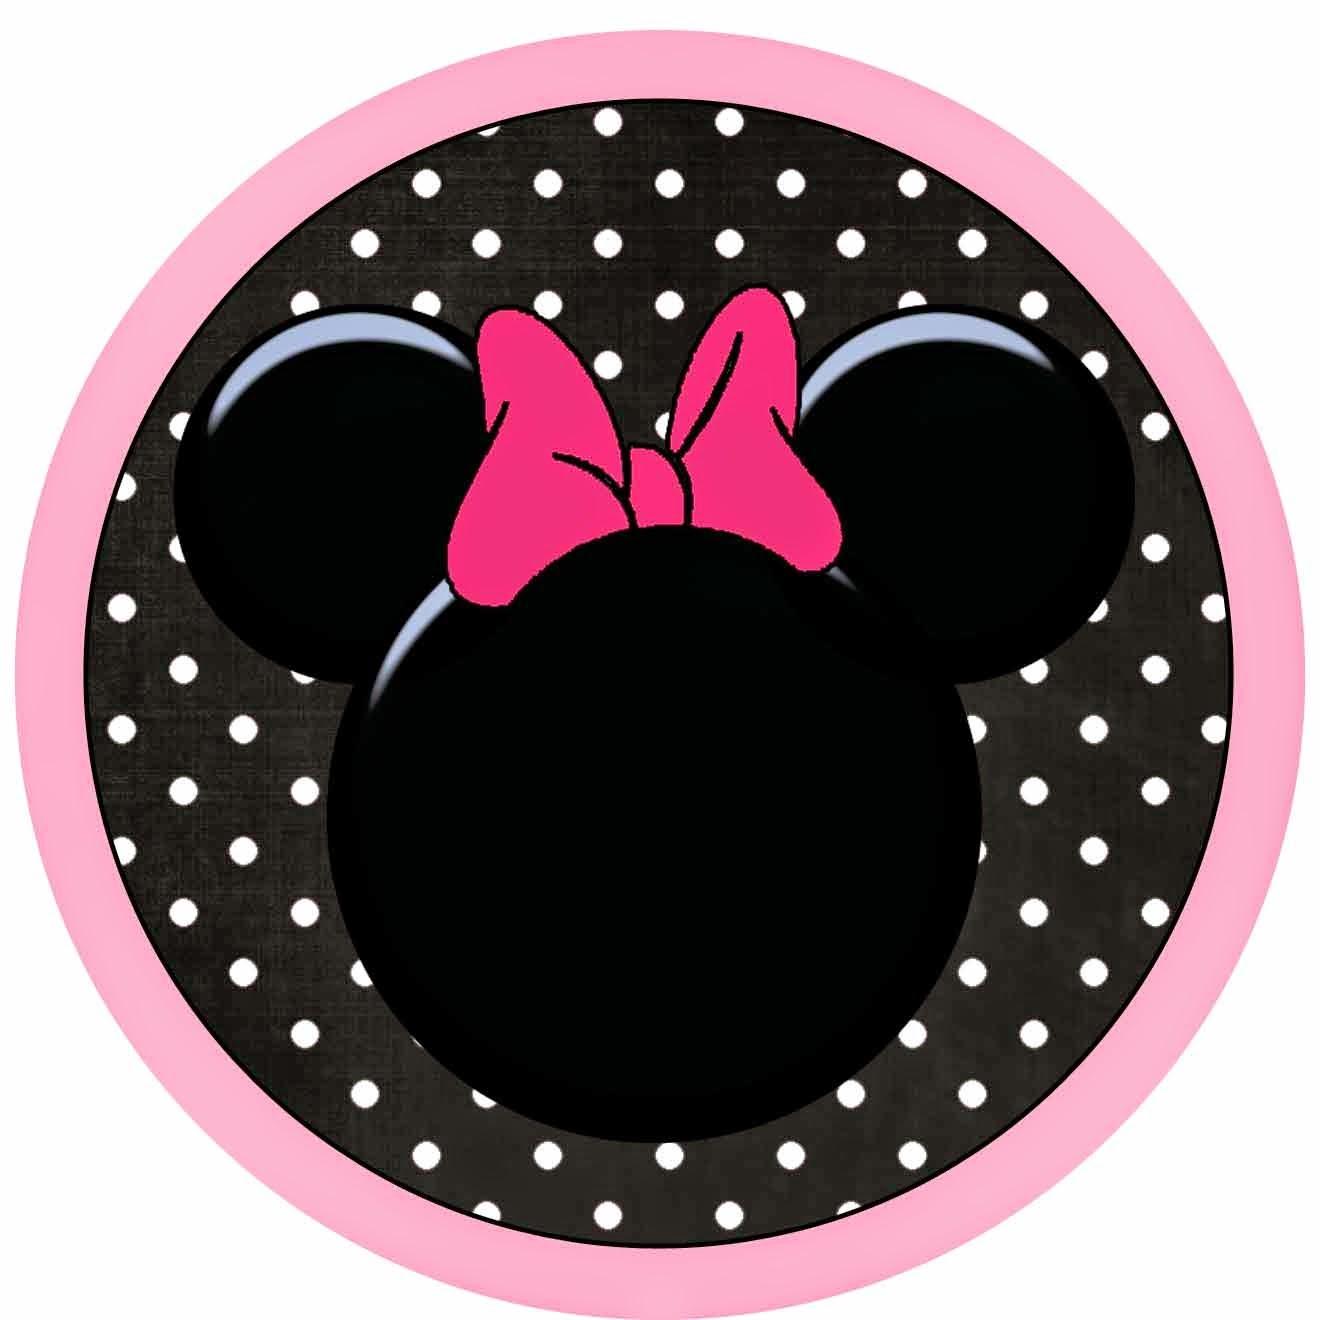 Toppers o Etiquetas para Imprimir Gratis de Minnie Mouse Rosa.